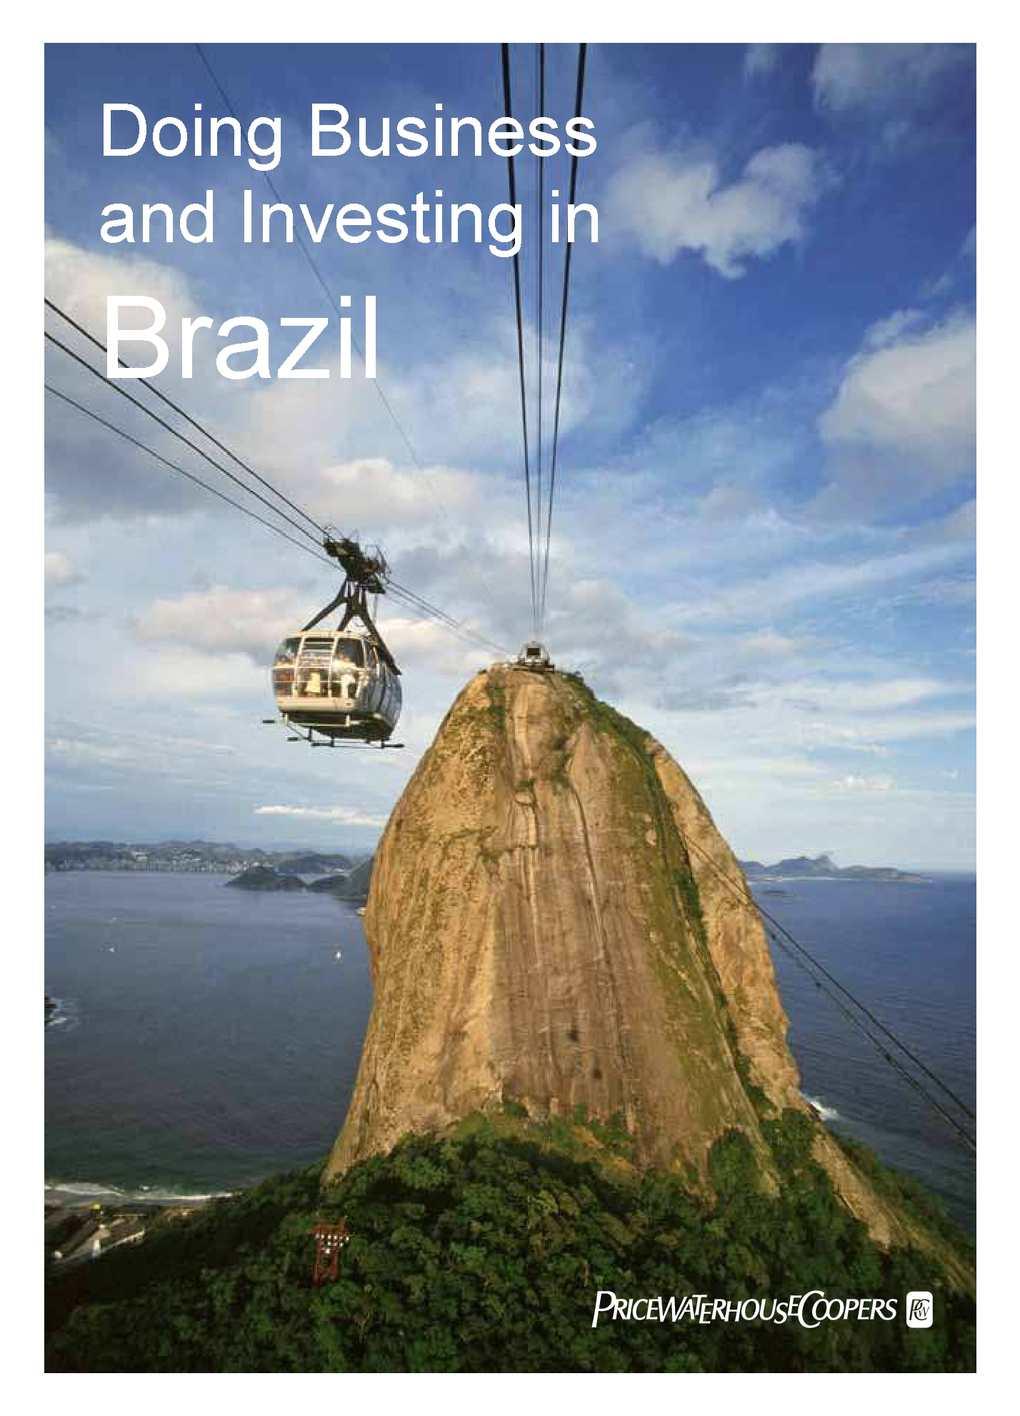 The Case For Investing In Brazil